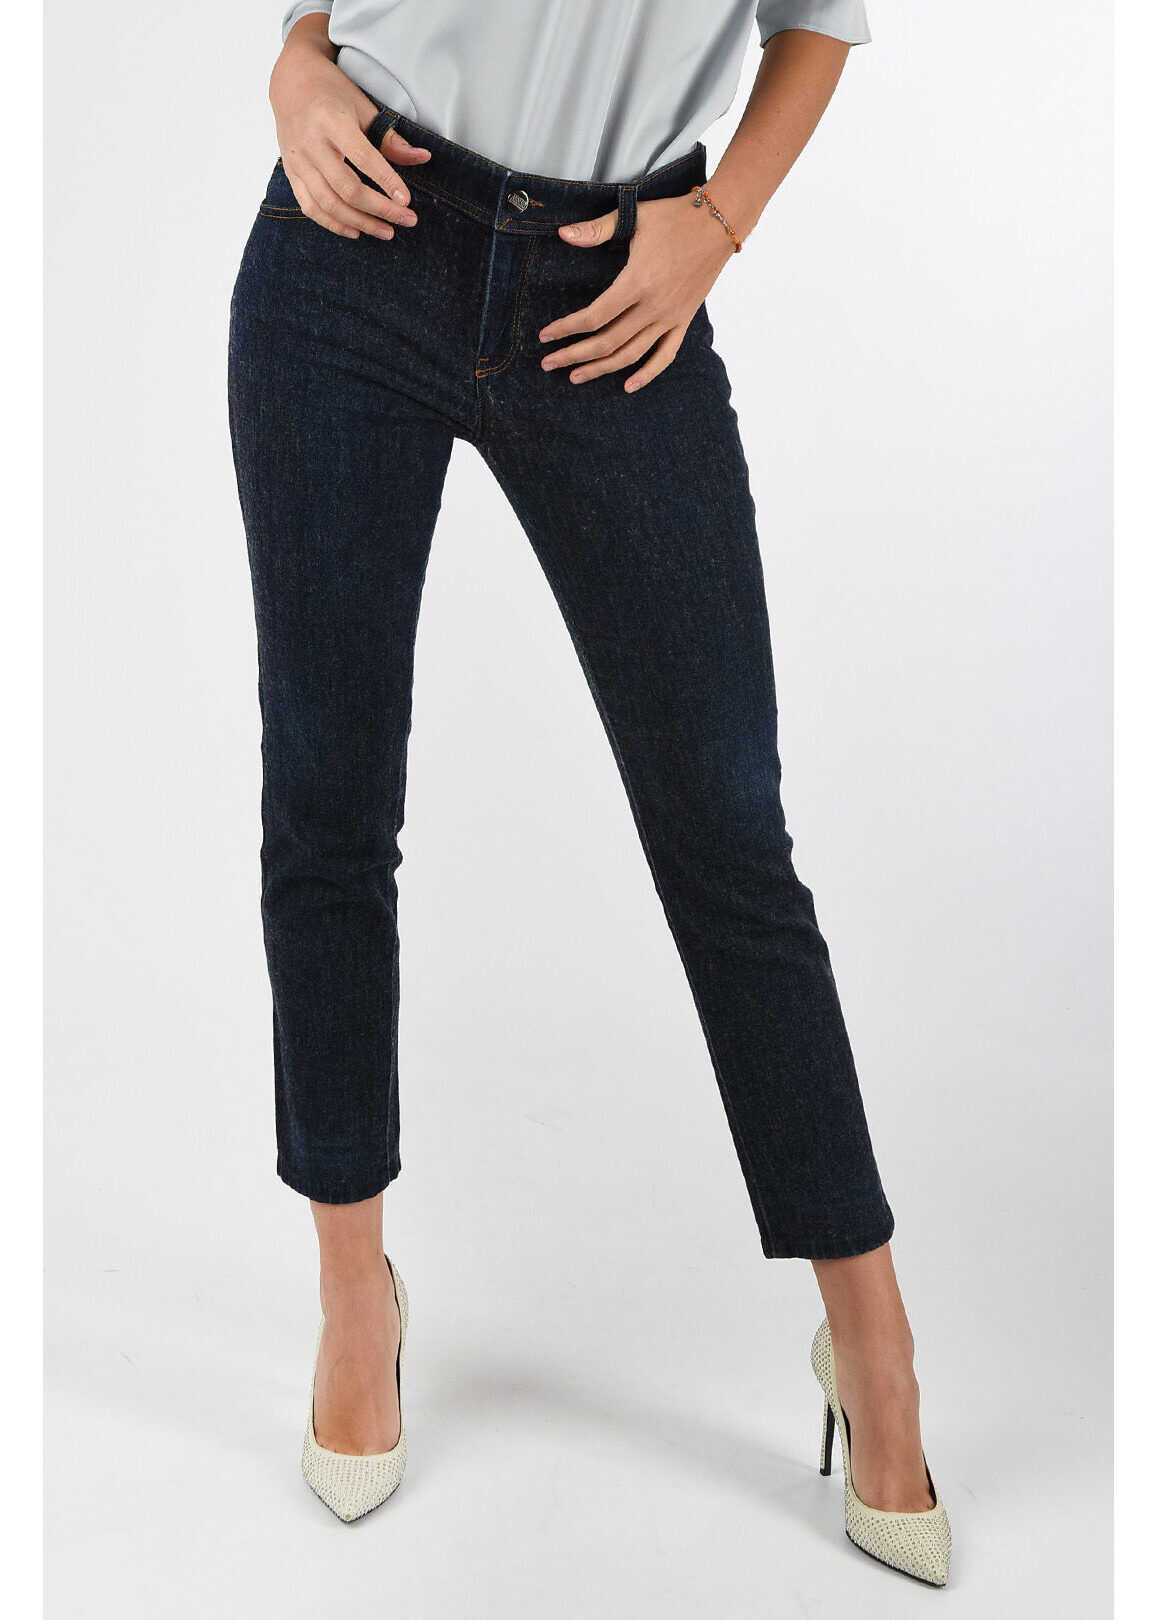 COLLEZIONI Wool and Denim Capri Jeans thumbnail